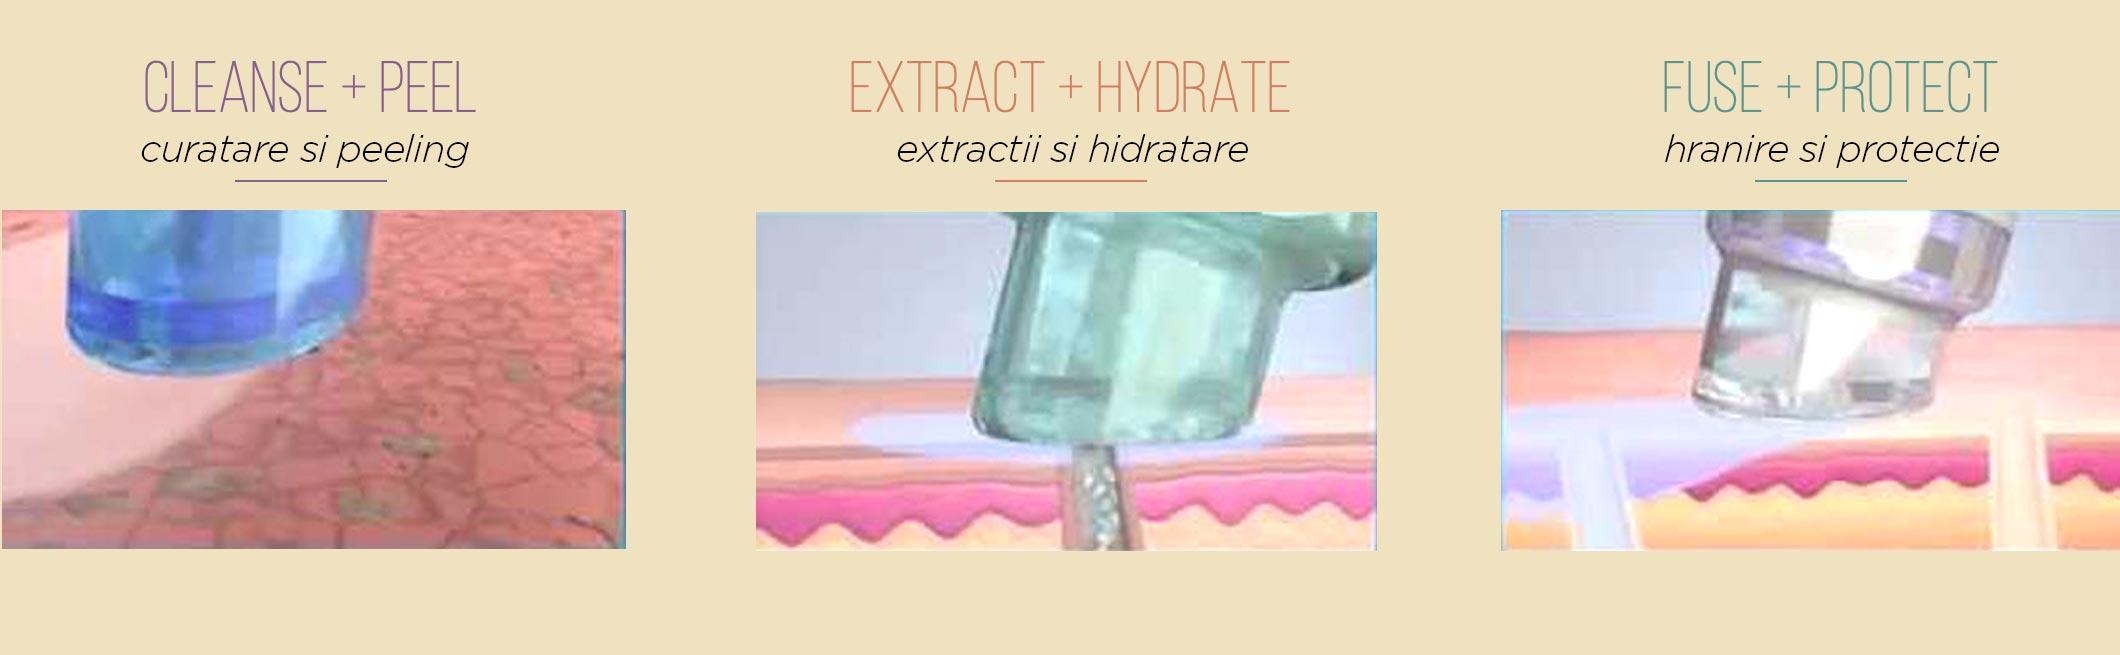 ilustrare tehnologie Hydrafacial pasi hidrodermabraziune